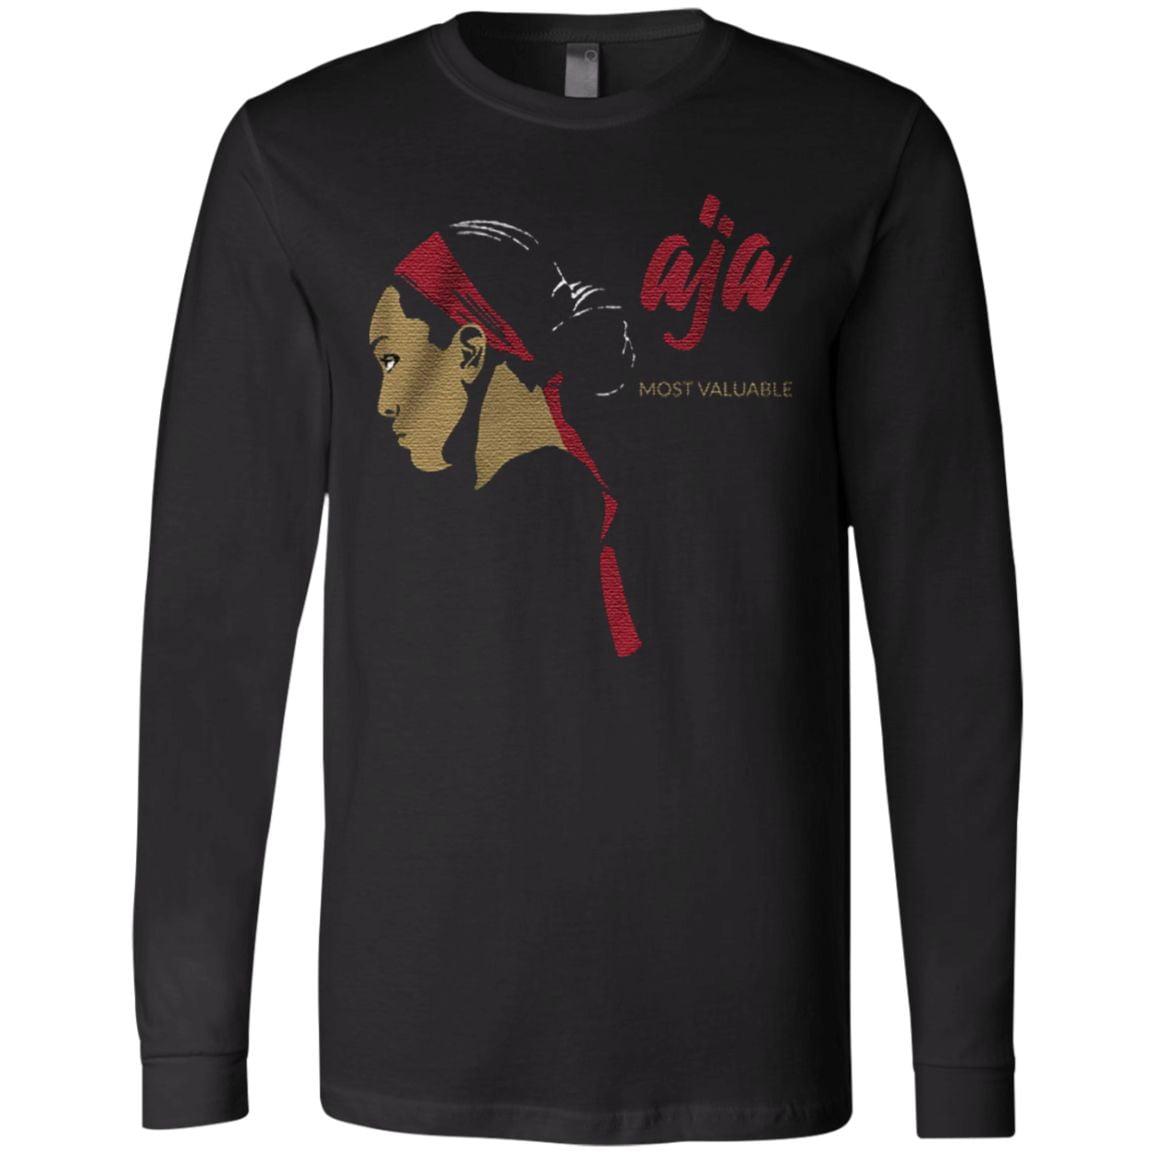 most valuable aja t shirt